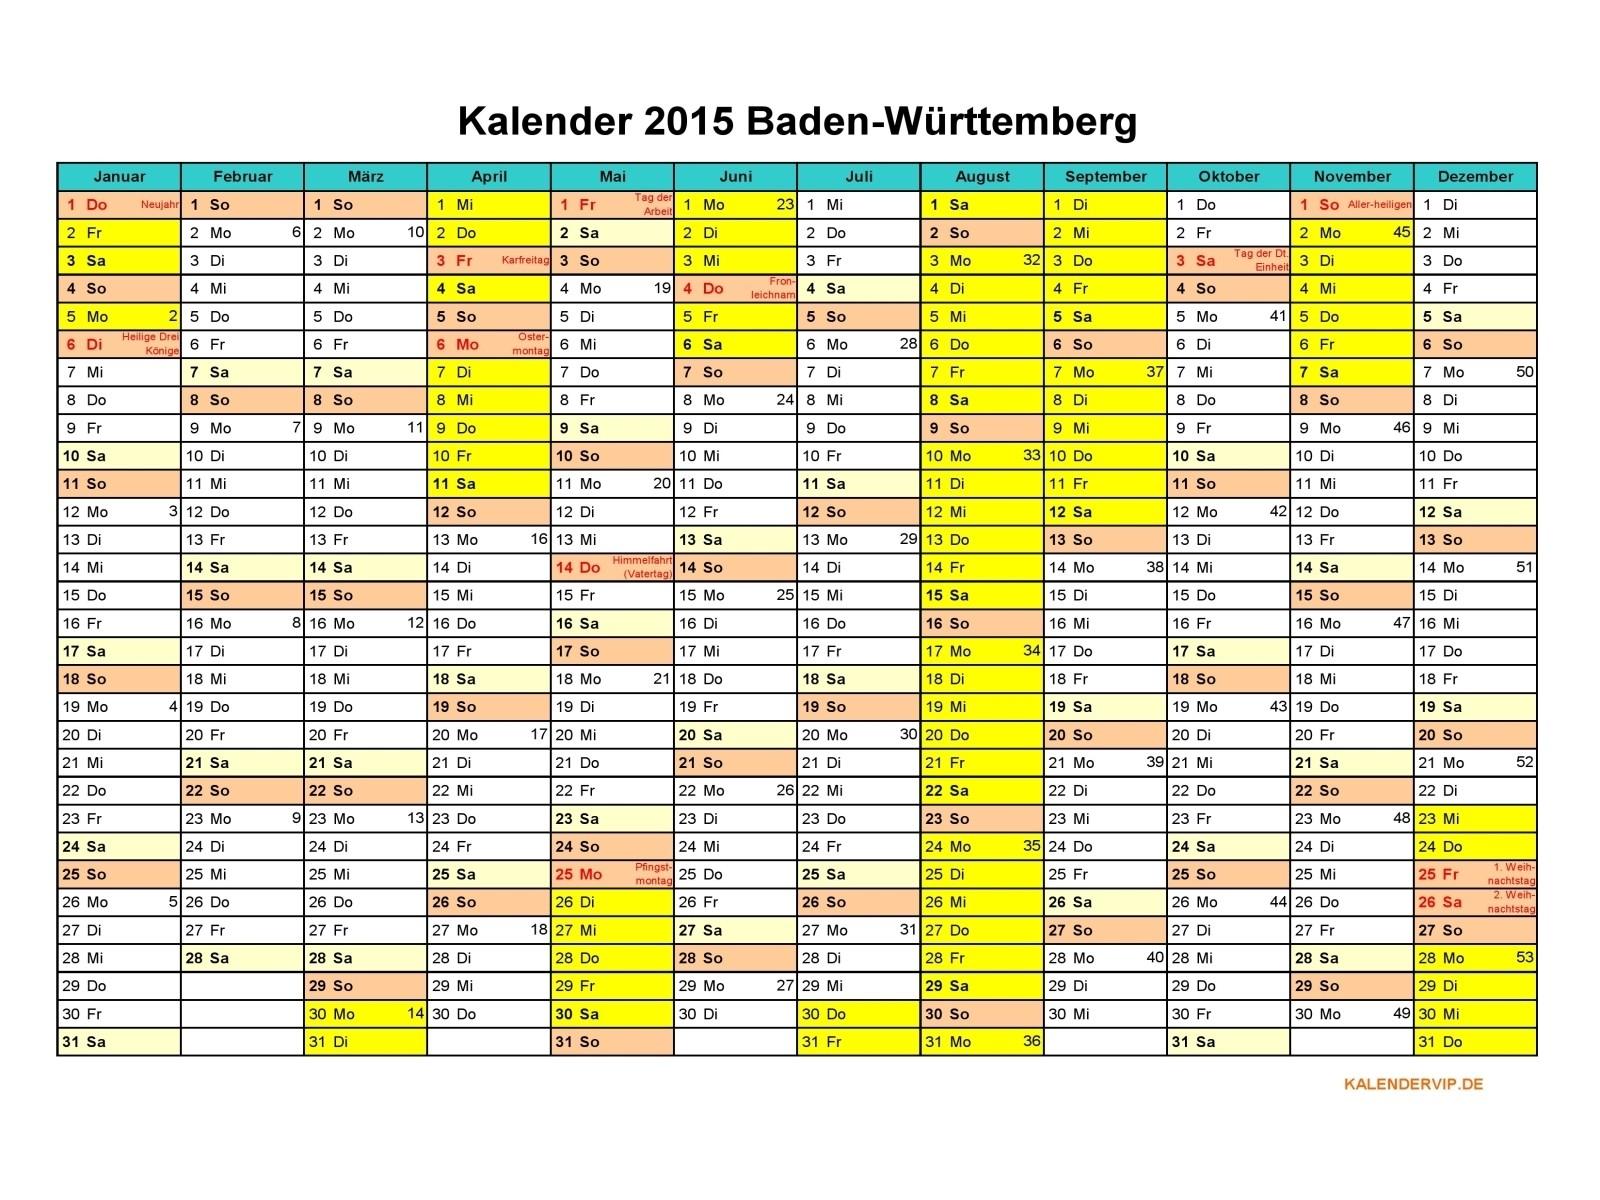 Kalender 2019 Pdf Baden Württemberg Más Arriba-a-fecha Kalender 2015 Baden Württemberg Kalendervip Of Kalender 2019 Pdf Baden Württemberg Actual Kalender 2019 Nrw Ausdrucken Ferien Feiertage Excel